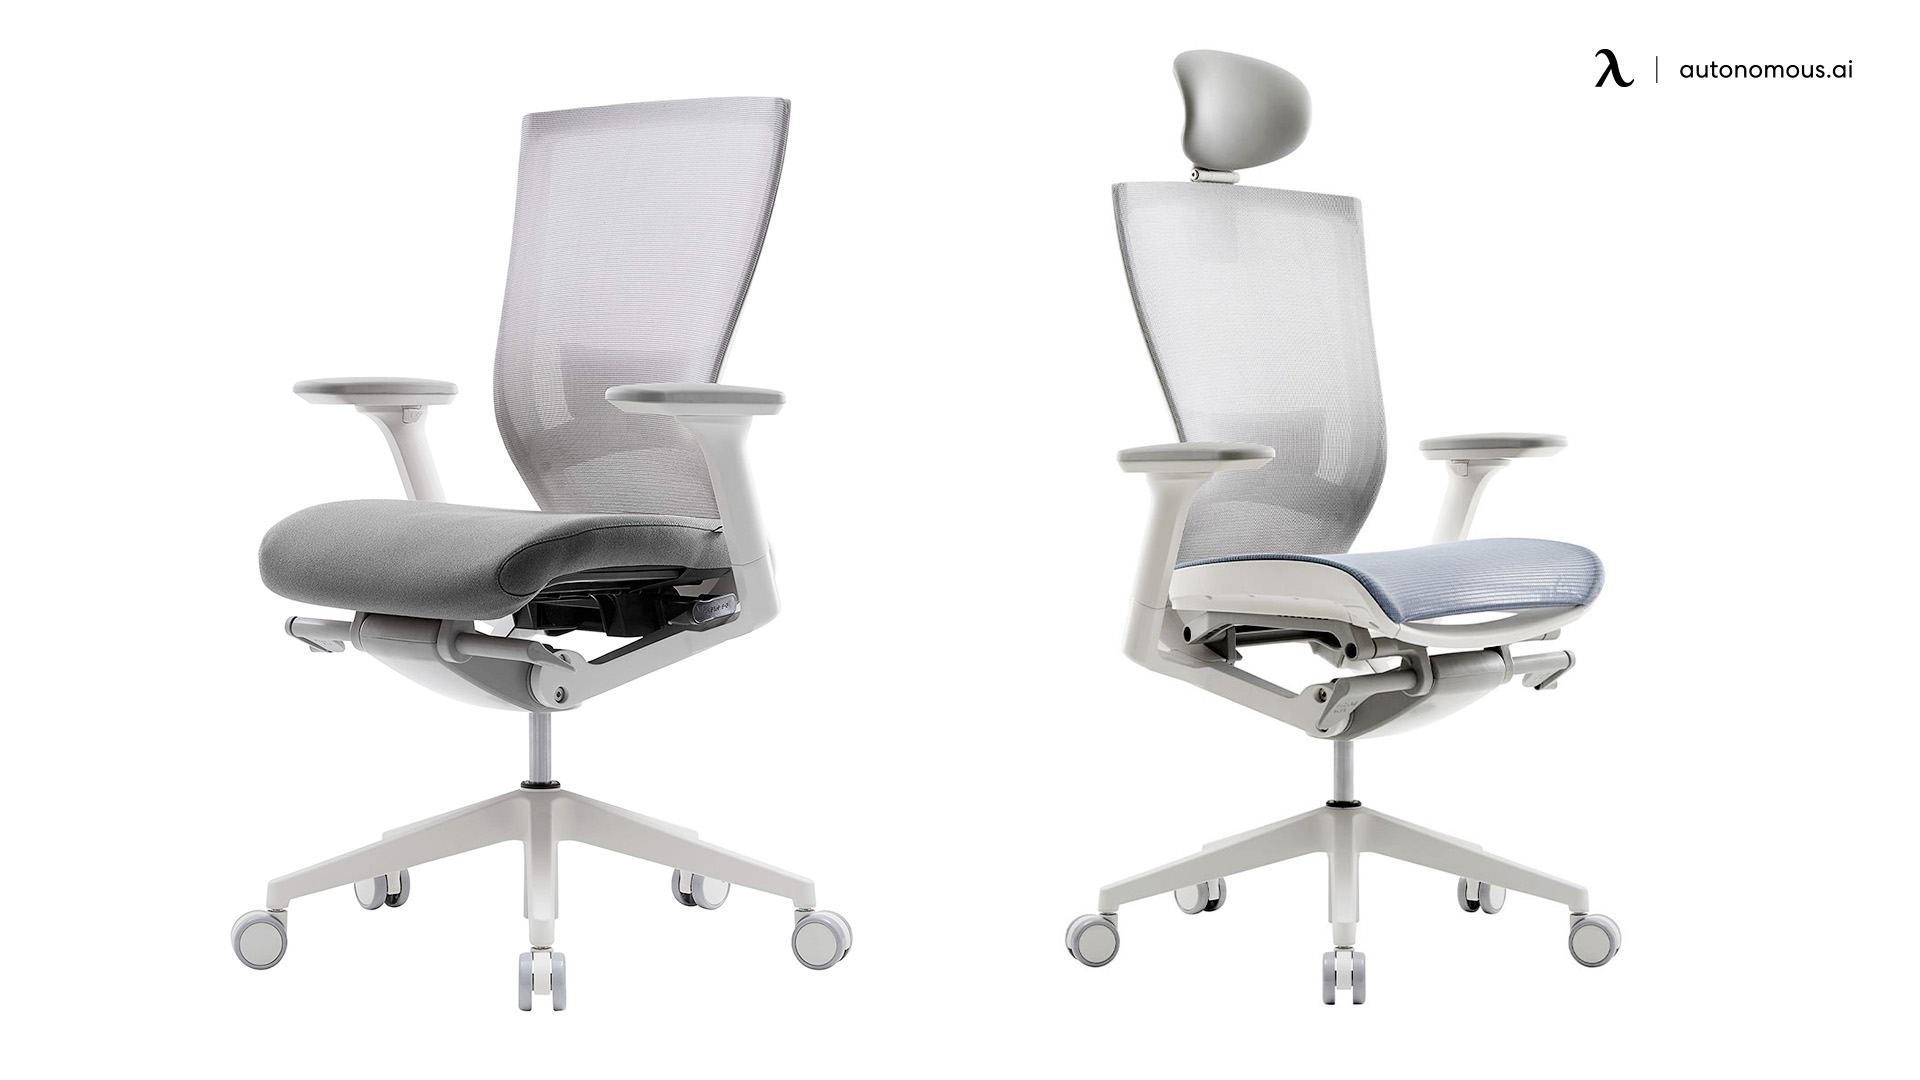 Sidiz T50 Ergonomic Office Chair